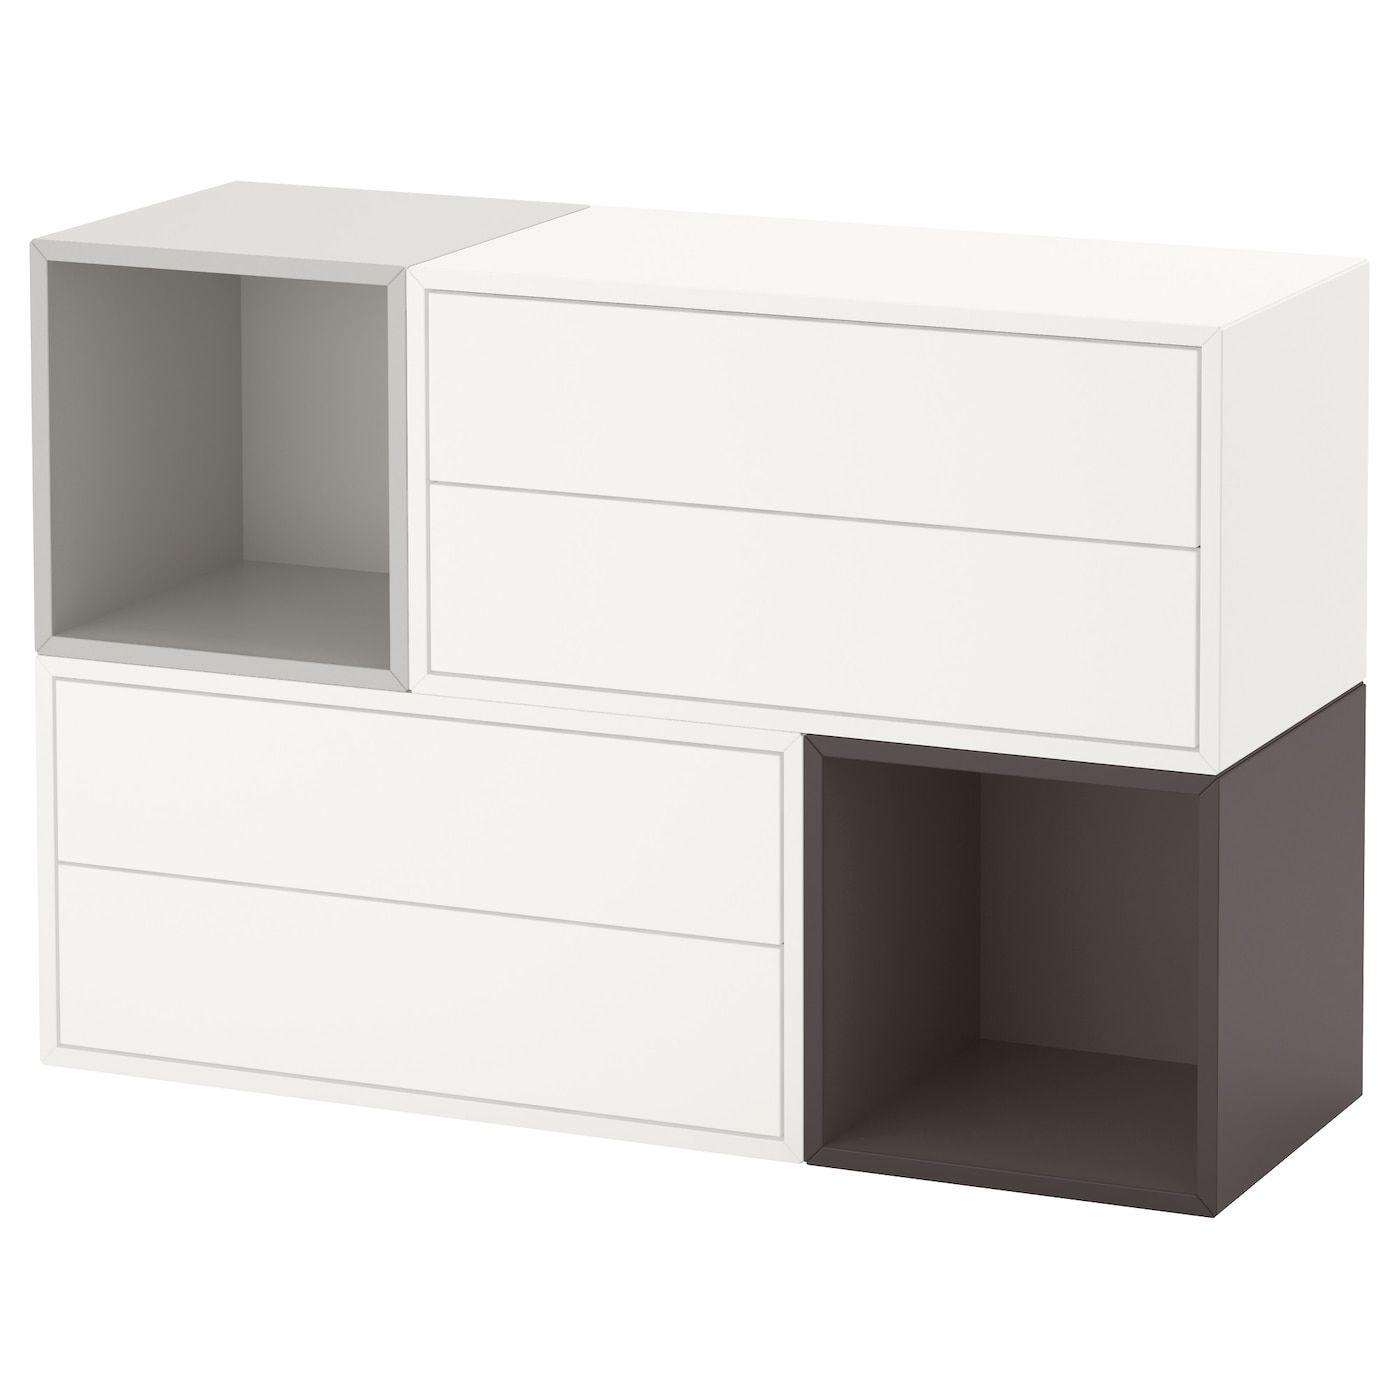 Eket Wall Mounted Cabinet Combination White Light Gray Dark Gray 41 3 8x13 3 4x27 1 2 Nel 2020 Mobili Ingresso Design Ikea Idee Ikea